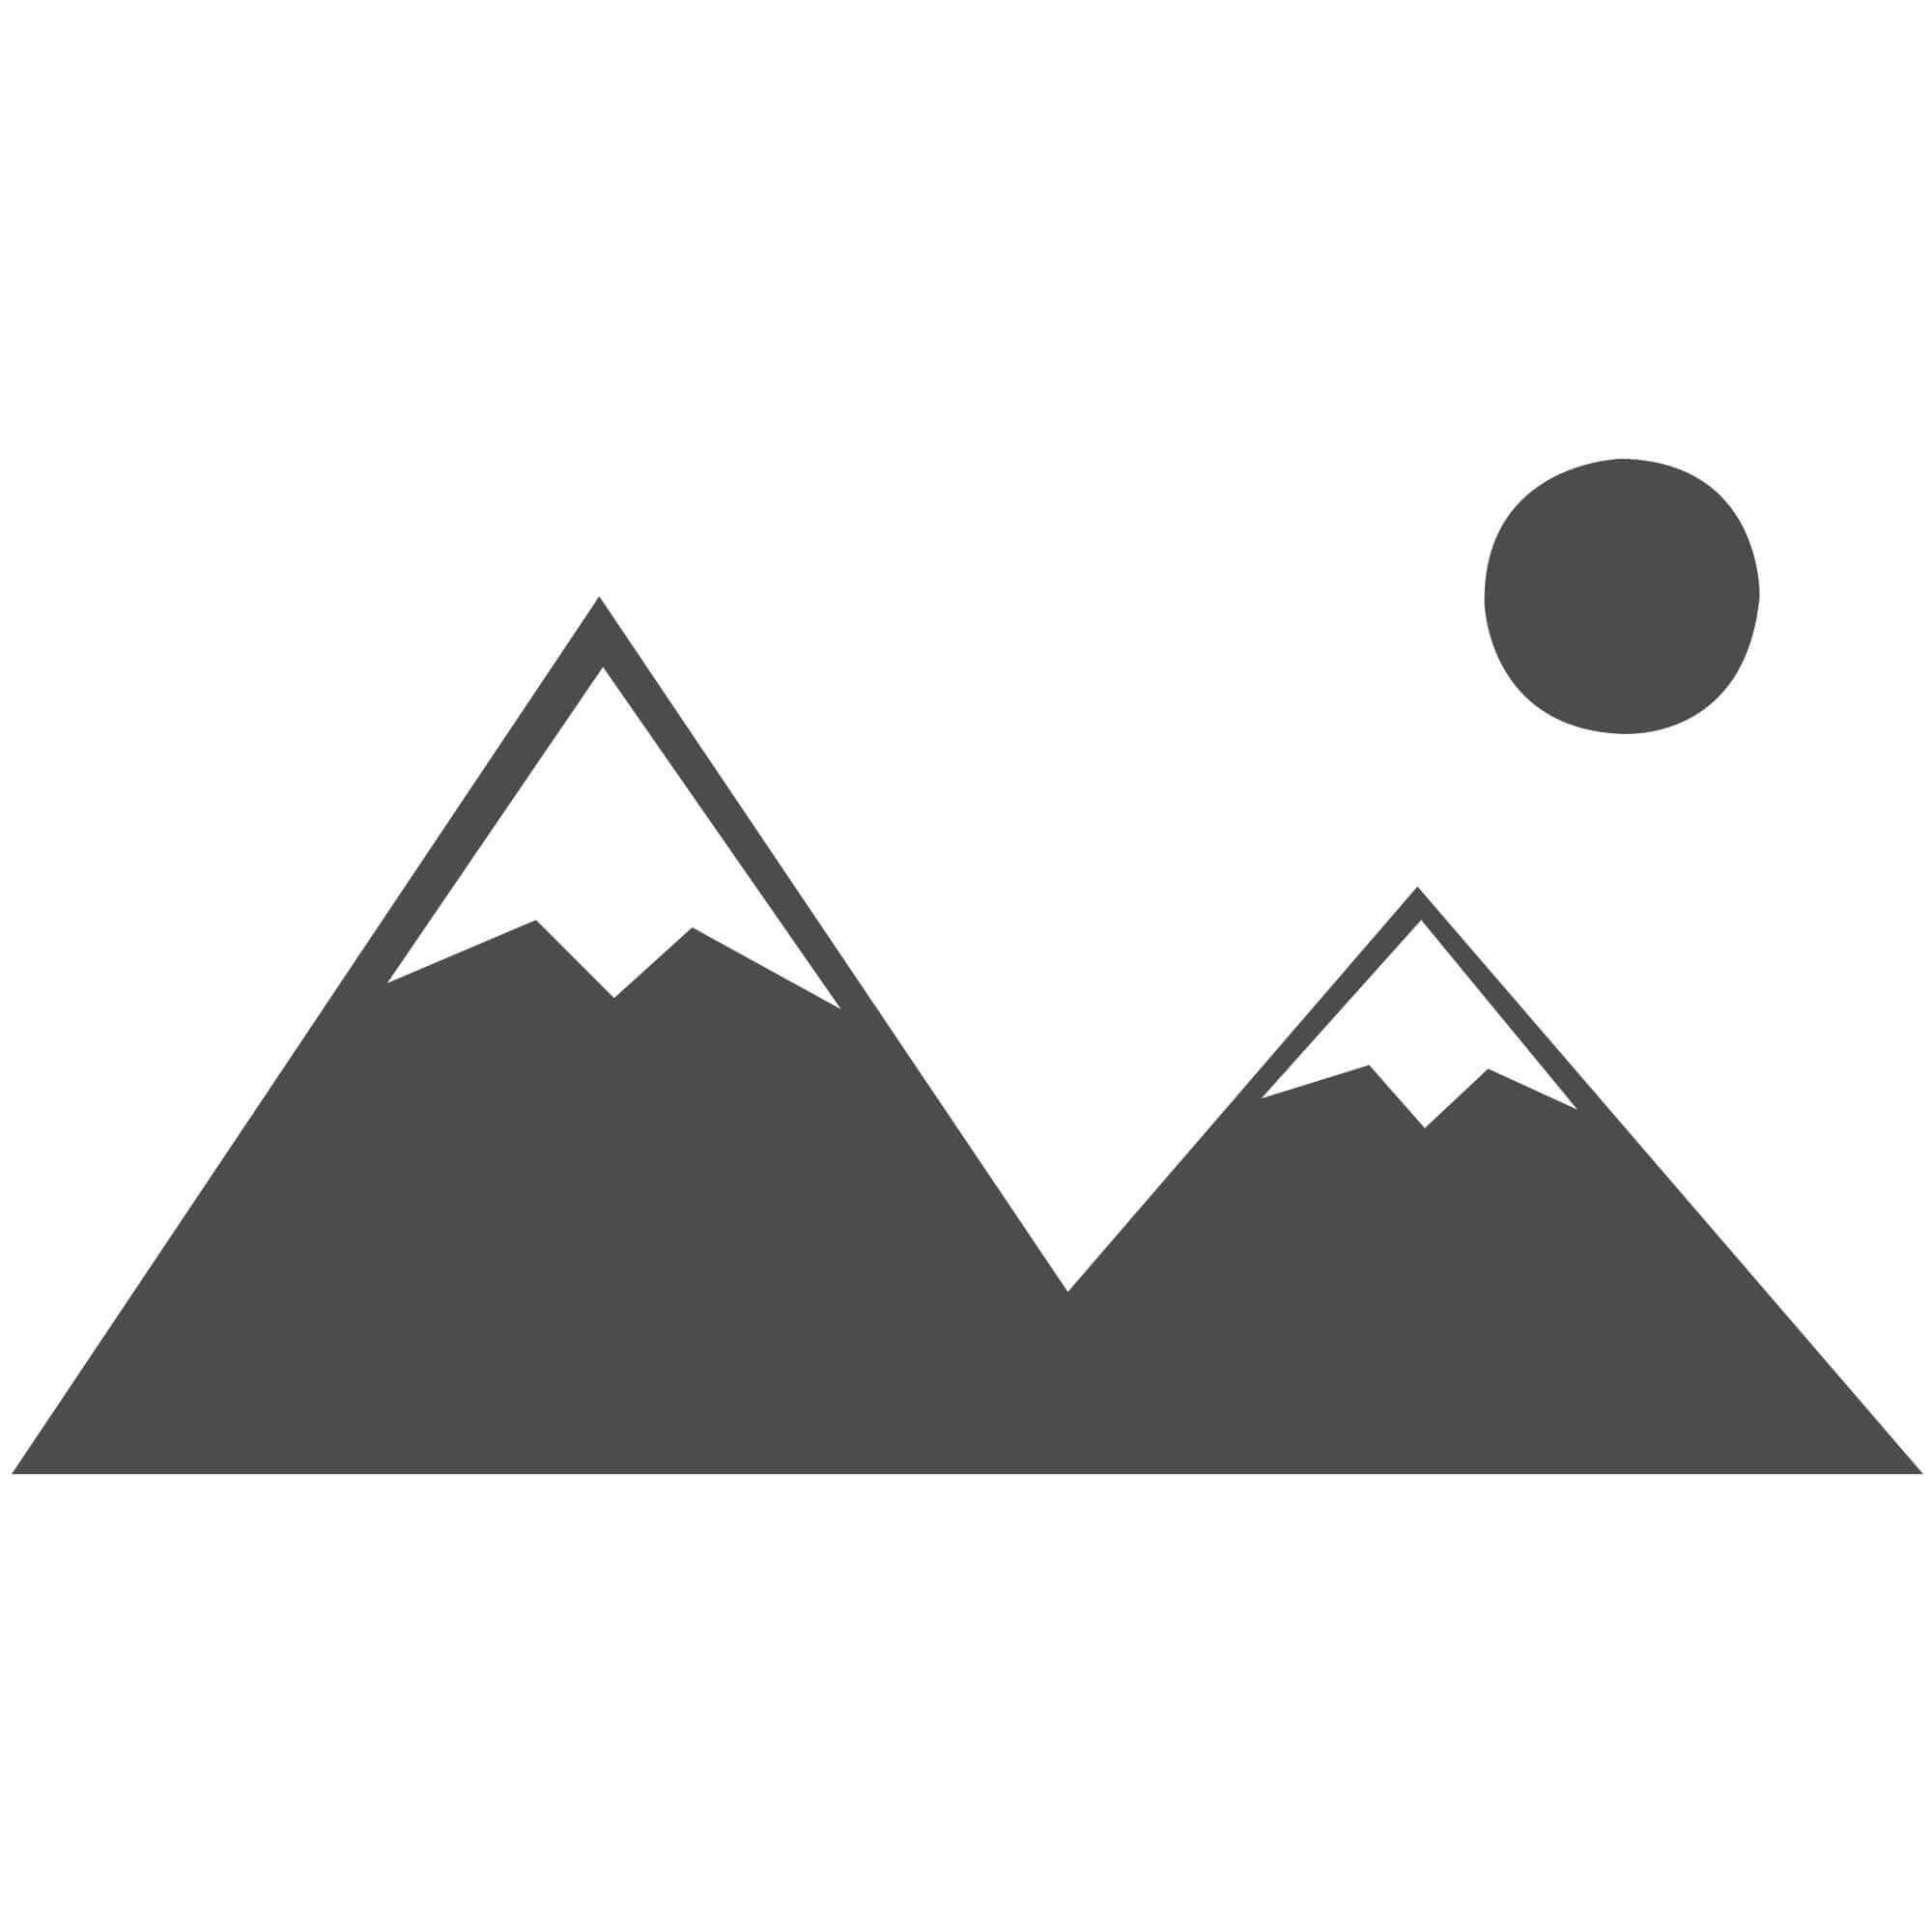 "Galleria Rug - Border Blue 63138 6191 - Size 80 x 150 cm (2'8"" x 5')"